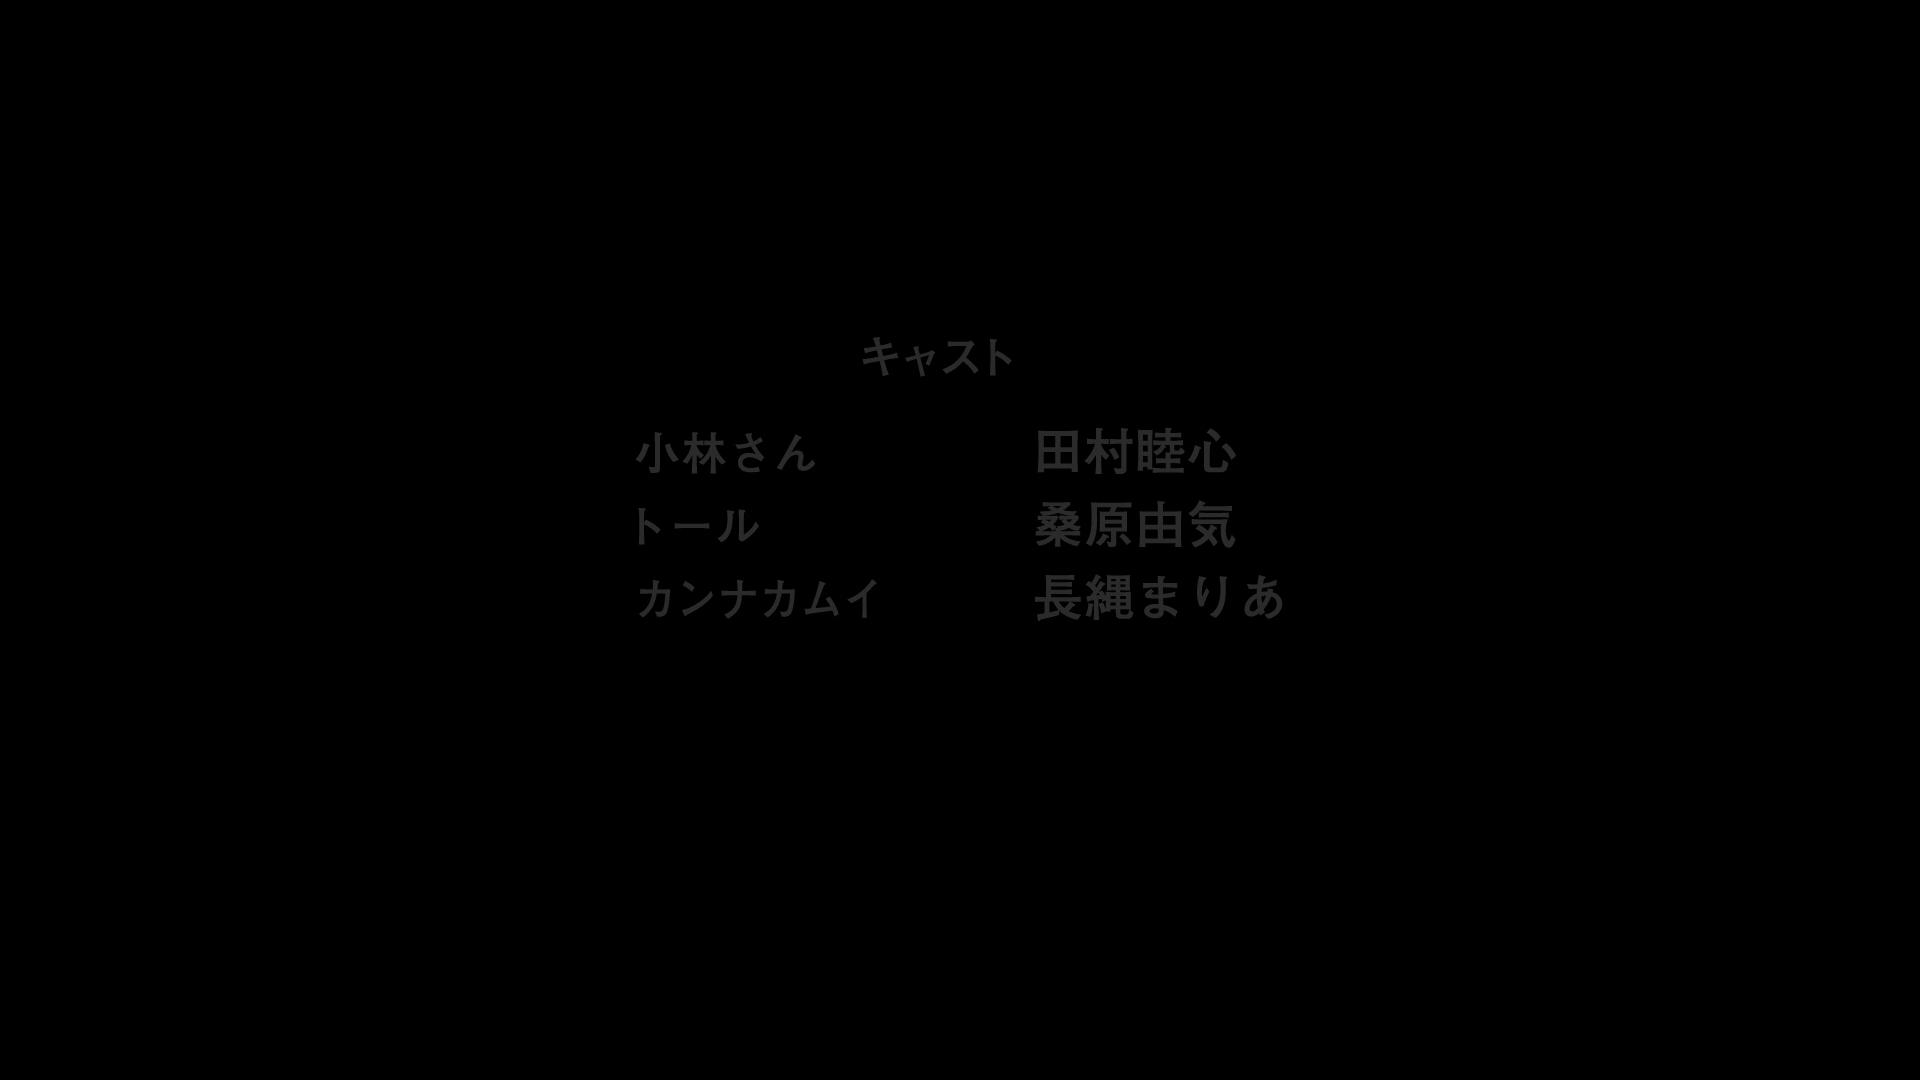 Kobayashi-san Chi no OO Dragon/Kobayashi-san Chi no OO